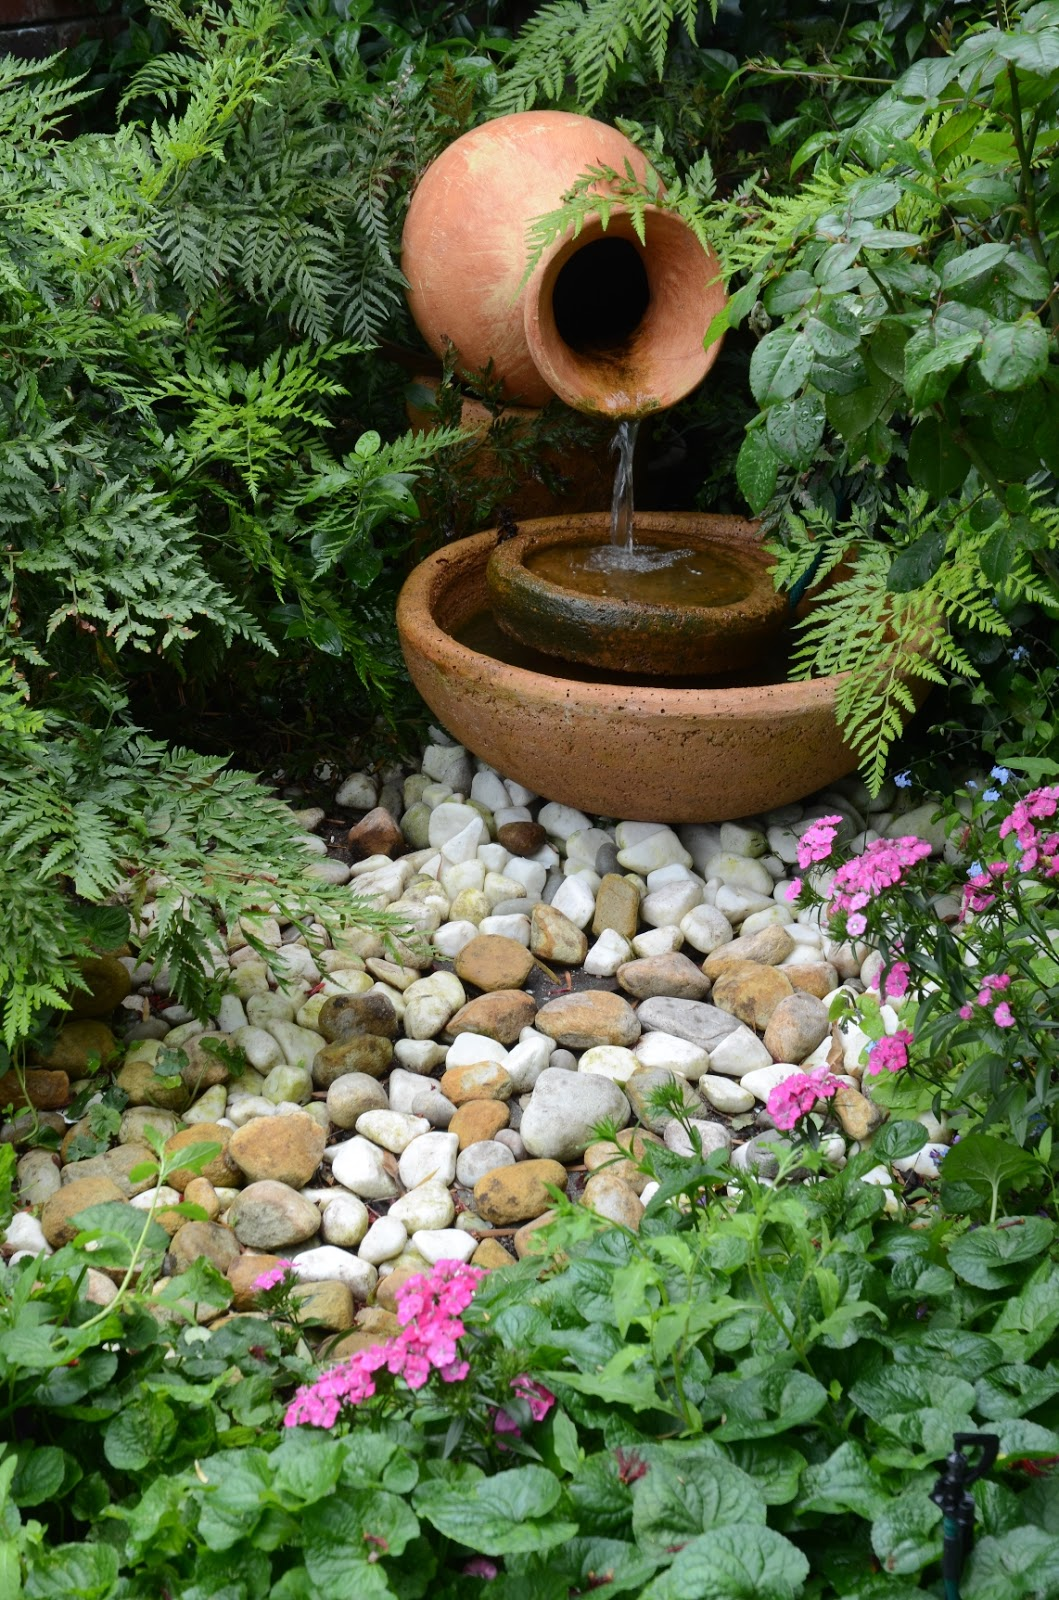 66 Square Feet (Plus): Cape Town Open Gardens